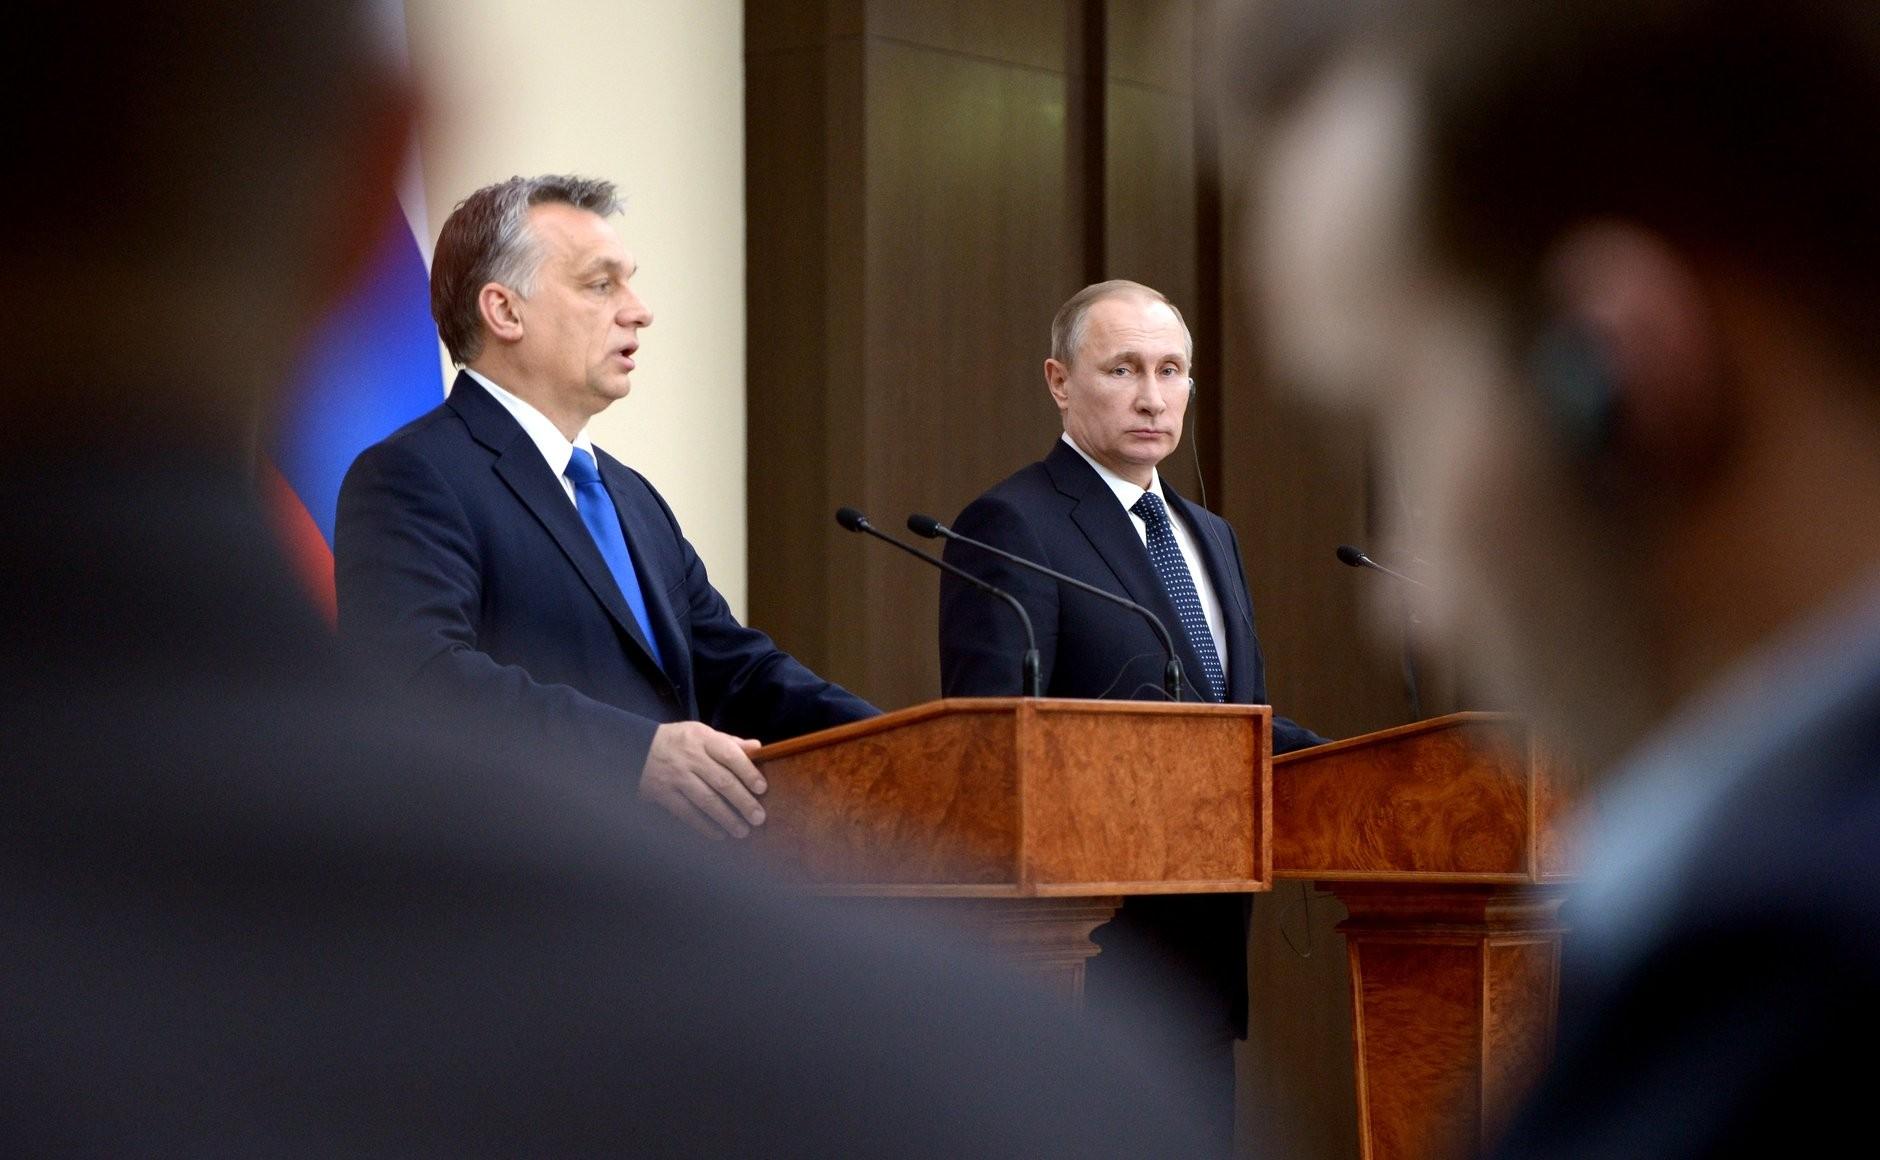 Viktor Orbán et Vladimir Poutine en 2018. Crédit photo : Kremlin